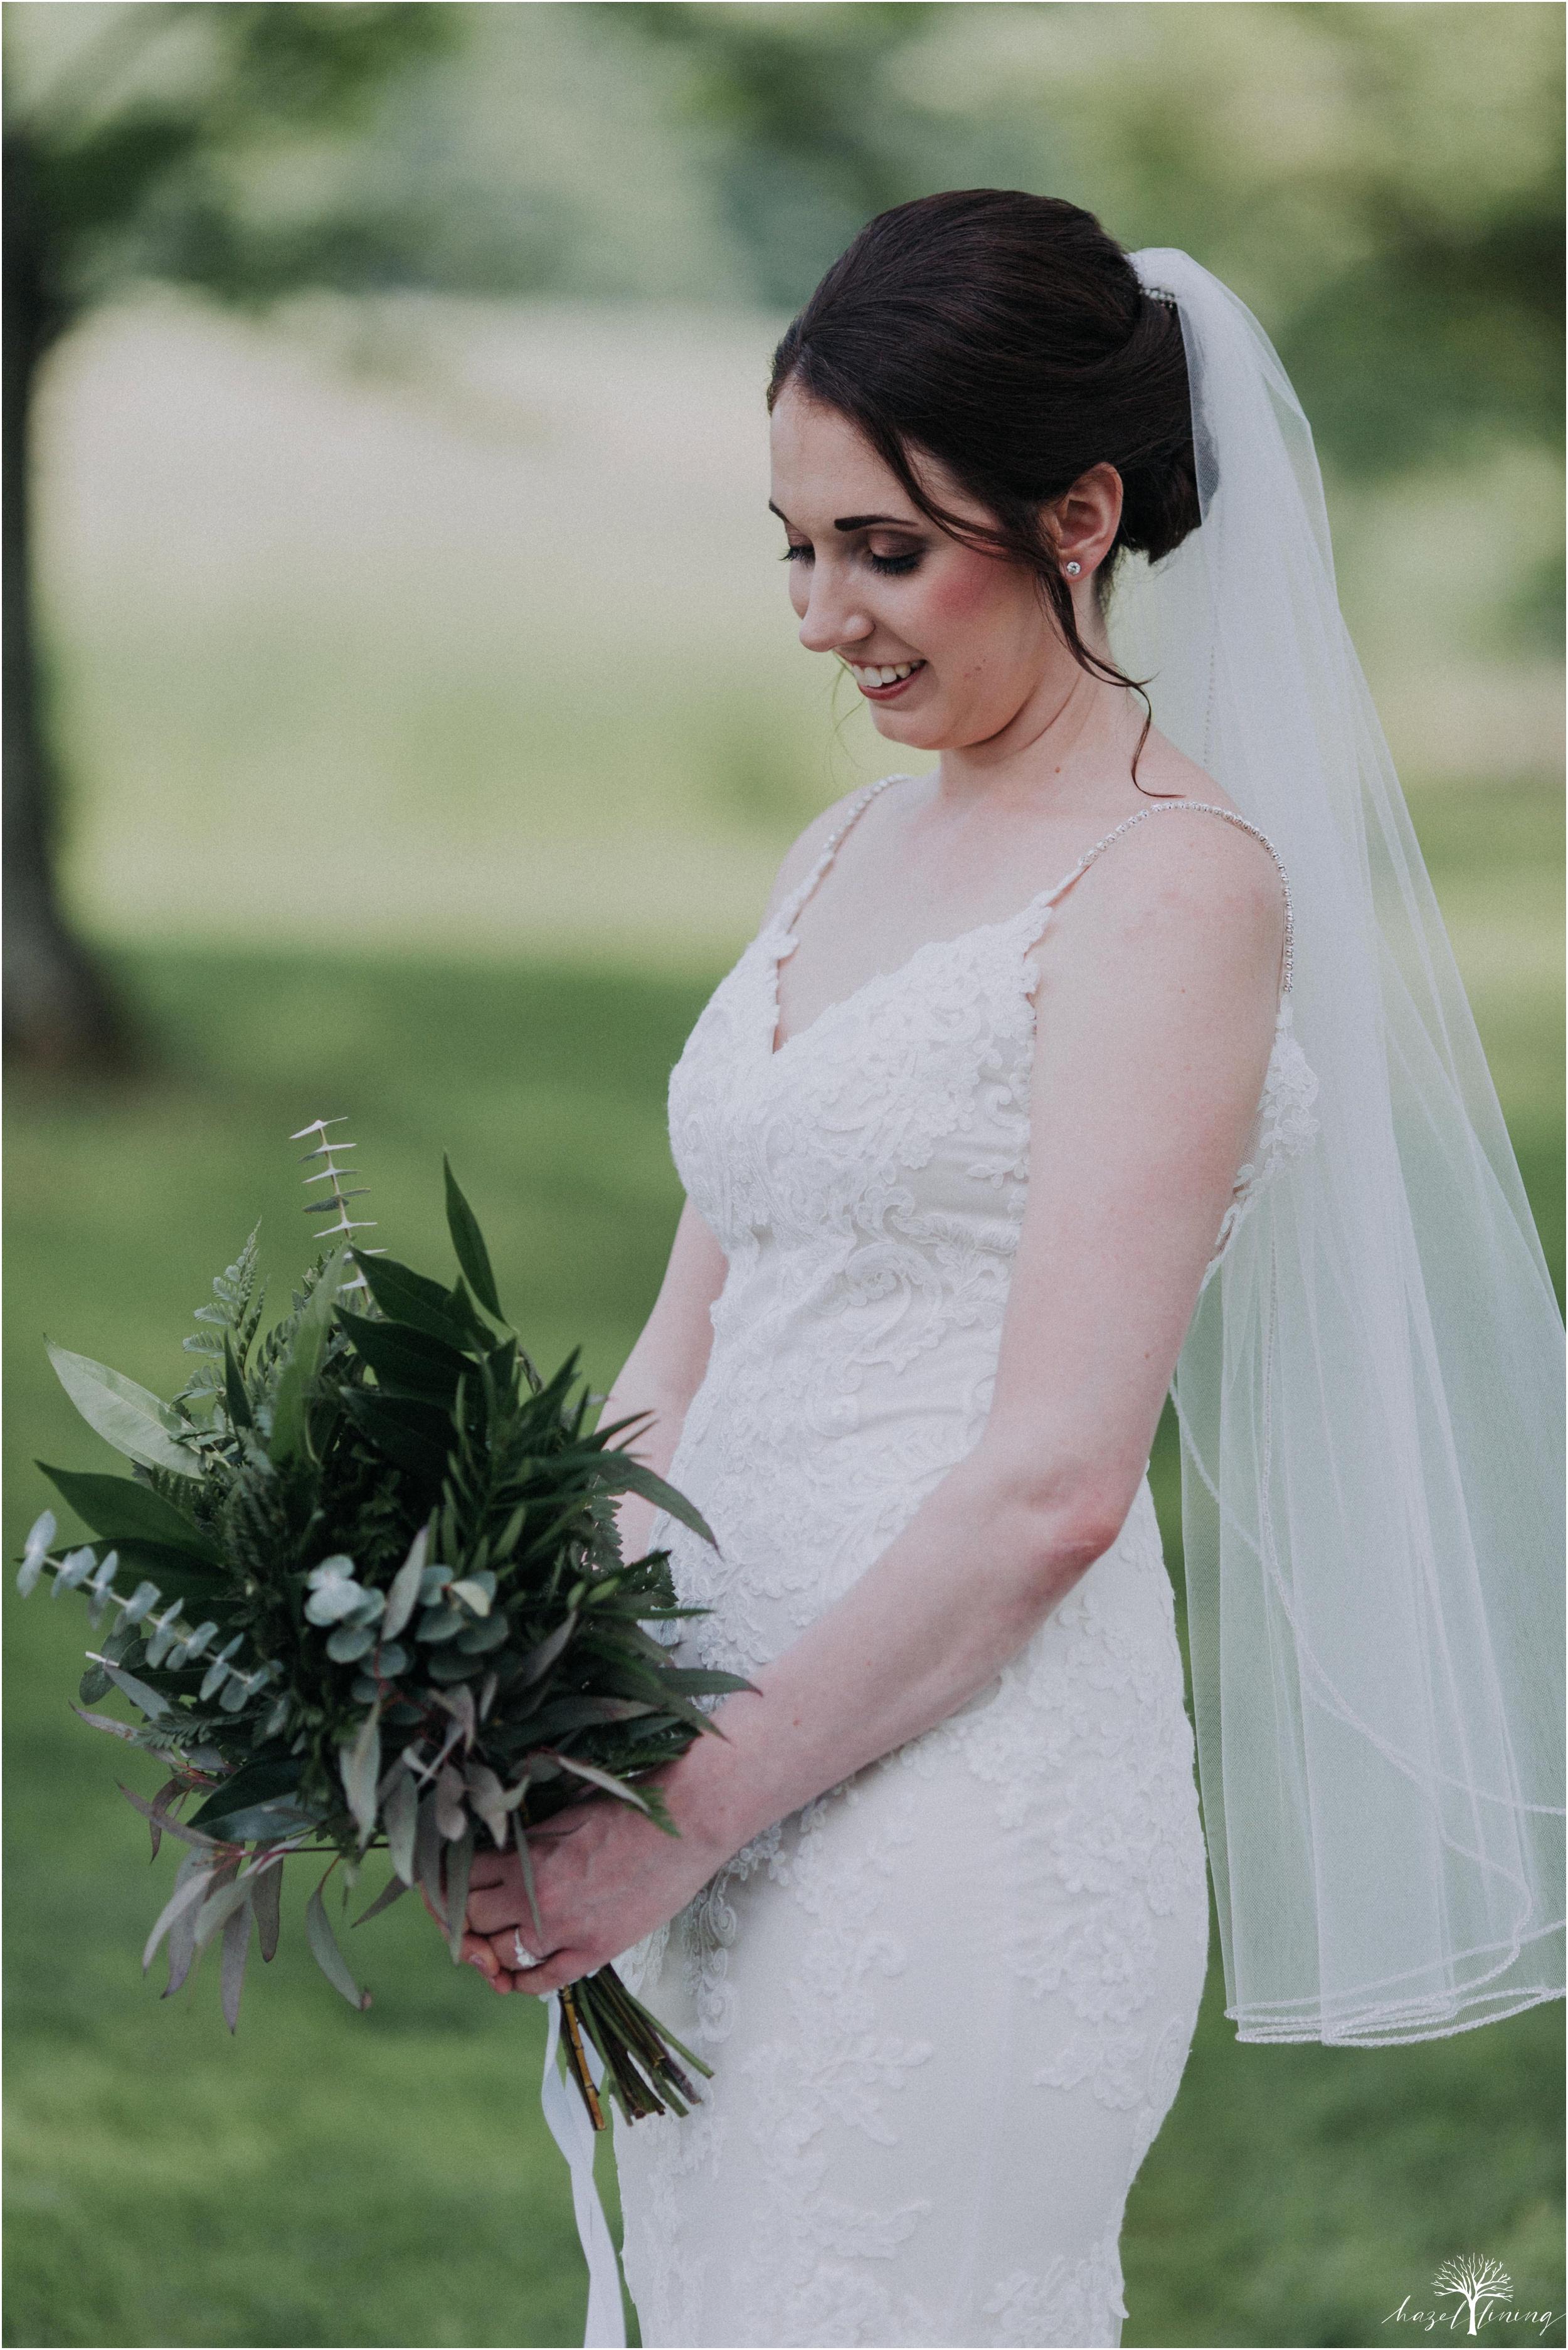 hazel-lining-travel-wedding-elopement-photography-lisa-landon-shoemaker-the-farm-bakery-and-events-bucks-county-quakertown-pennsylvania-summer-country-outdoor-farm-wedding_0019.jpg